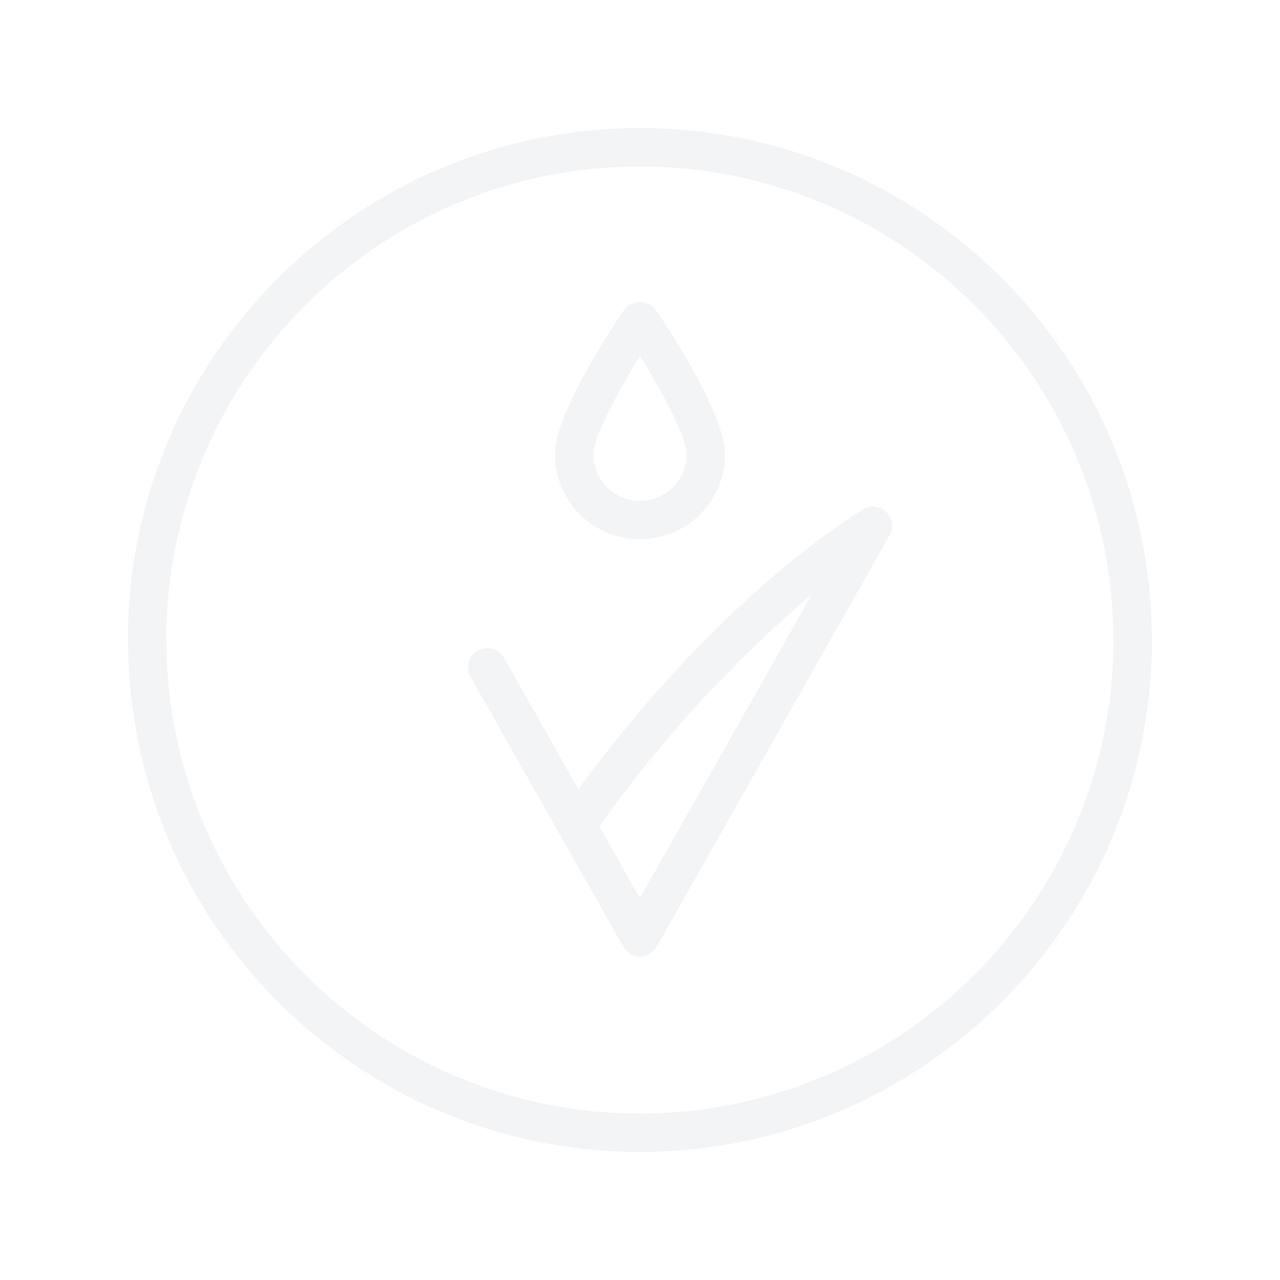 NATURA ESTONICA BIO Ginseng & Acai Face Peeling 150ml